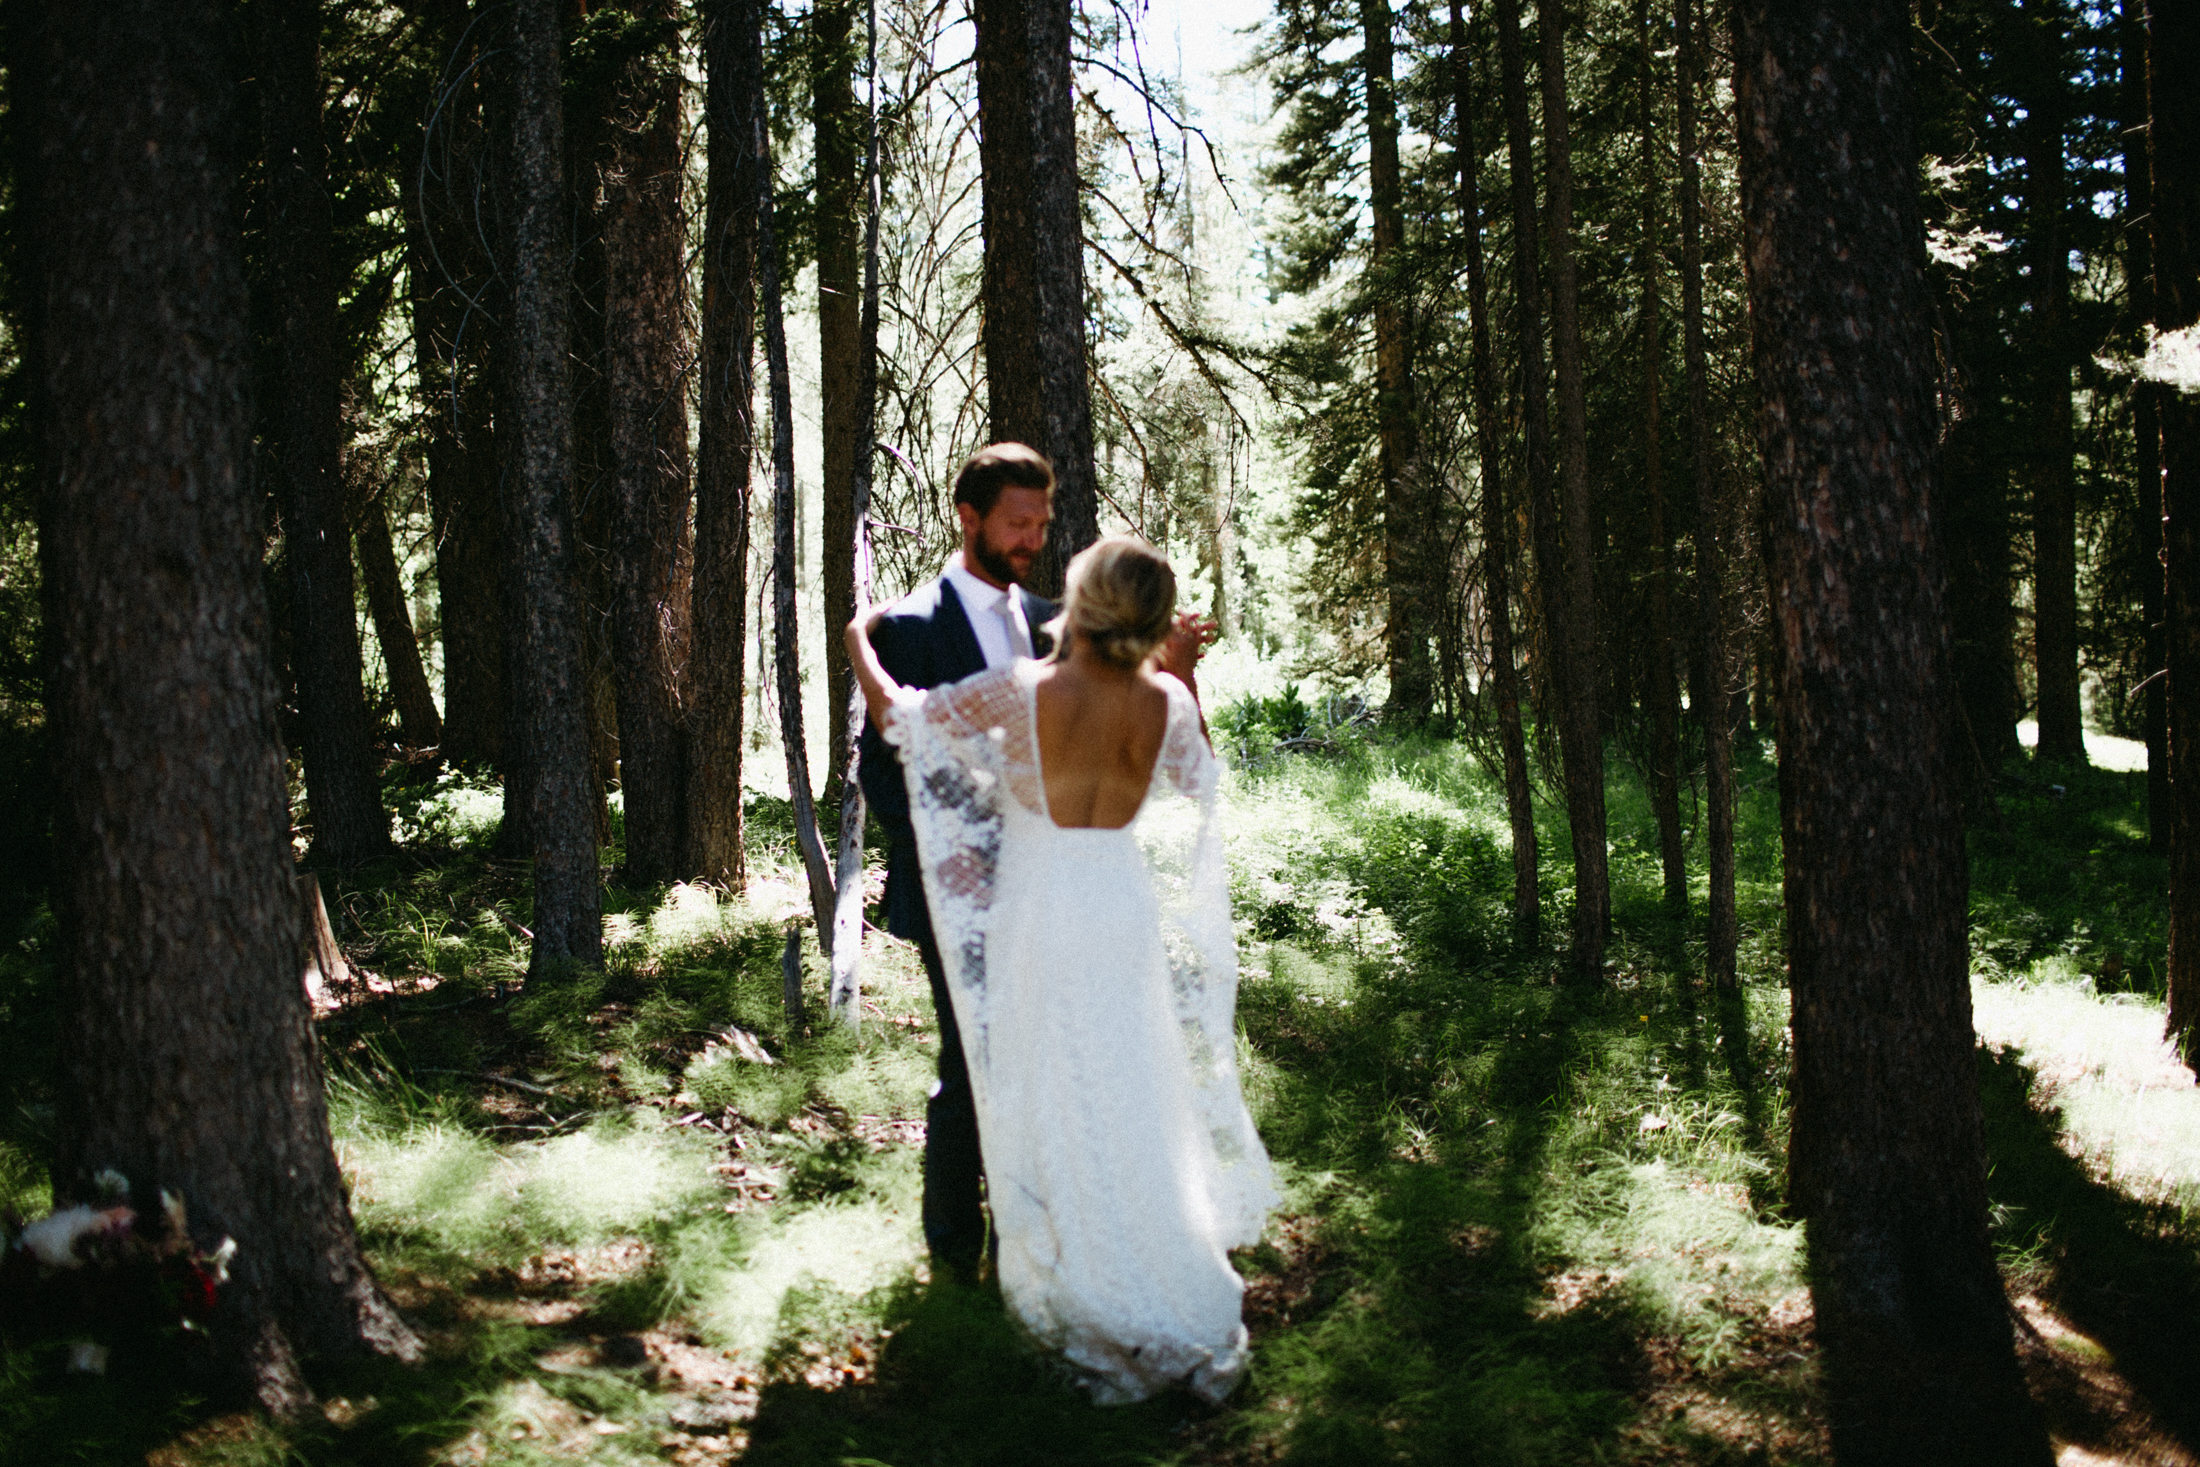 idaho-4h-camp-wedding-christinemarie-72.jpg